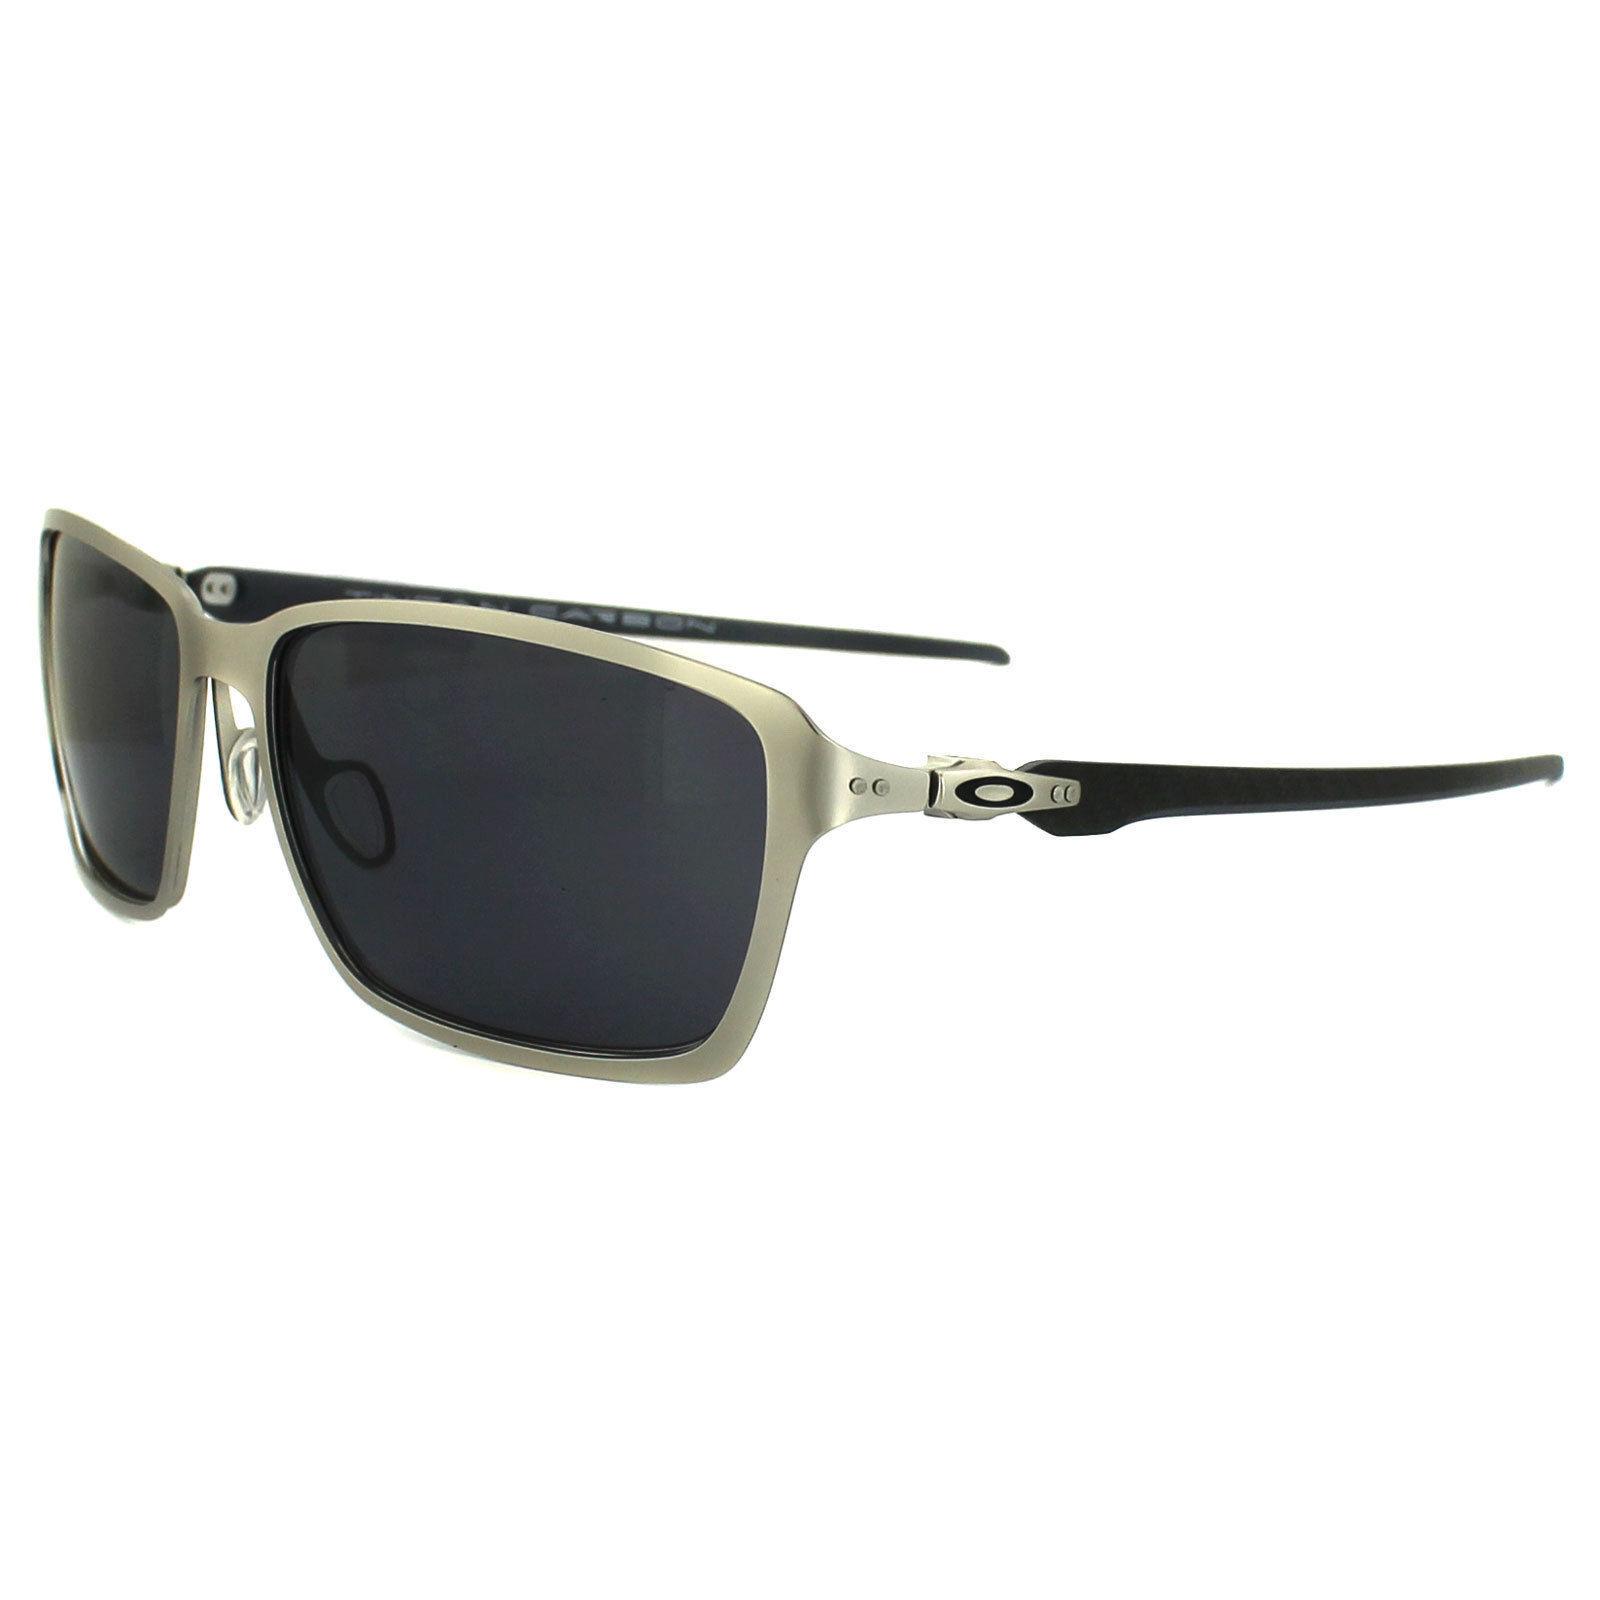 Oakley OO6017-01 Tincan Carbon Satin Chrome Sunglasses | eBay